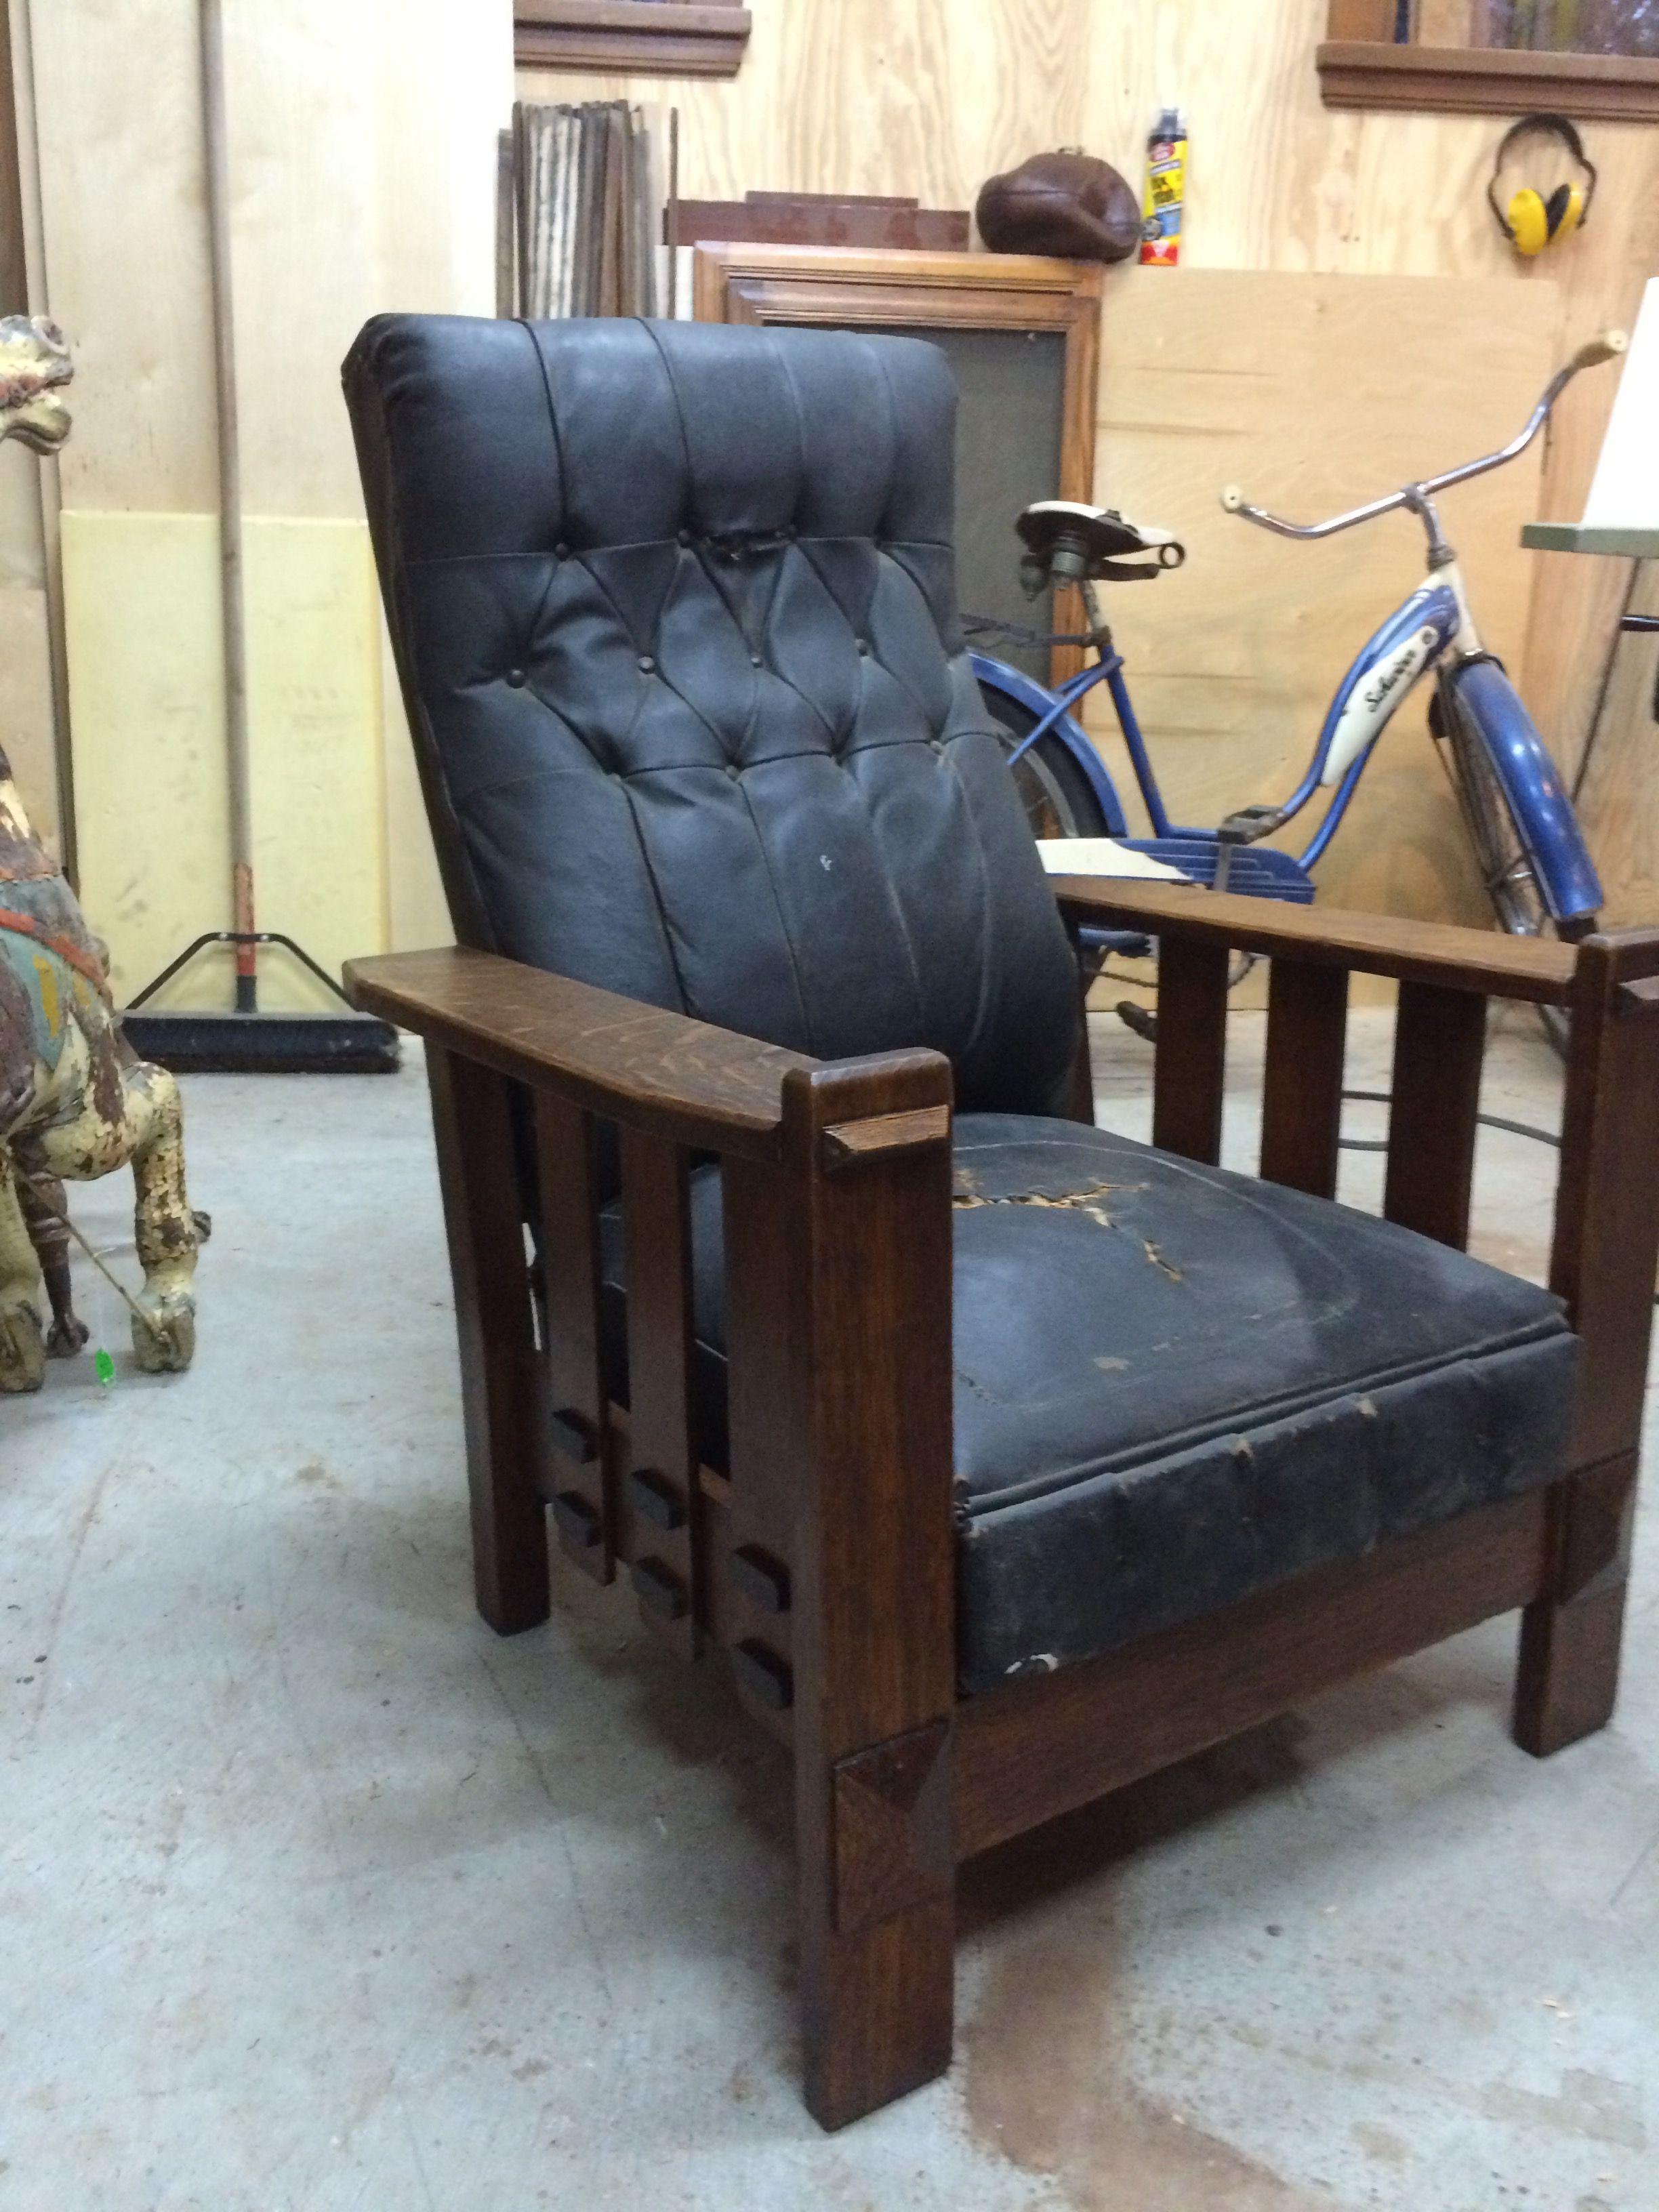 Brilliant Morris Chair 1905 1 4 Sawn Oak Called A The Imperial Spiritservingveterans Wood Chair Design Ideas Spiritservingveteransorg